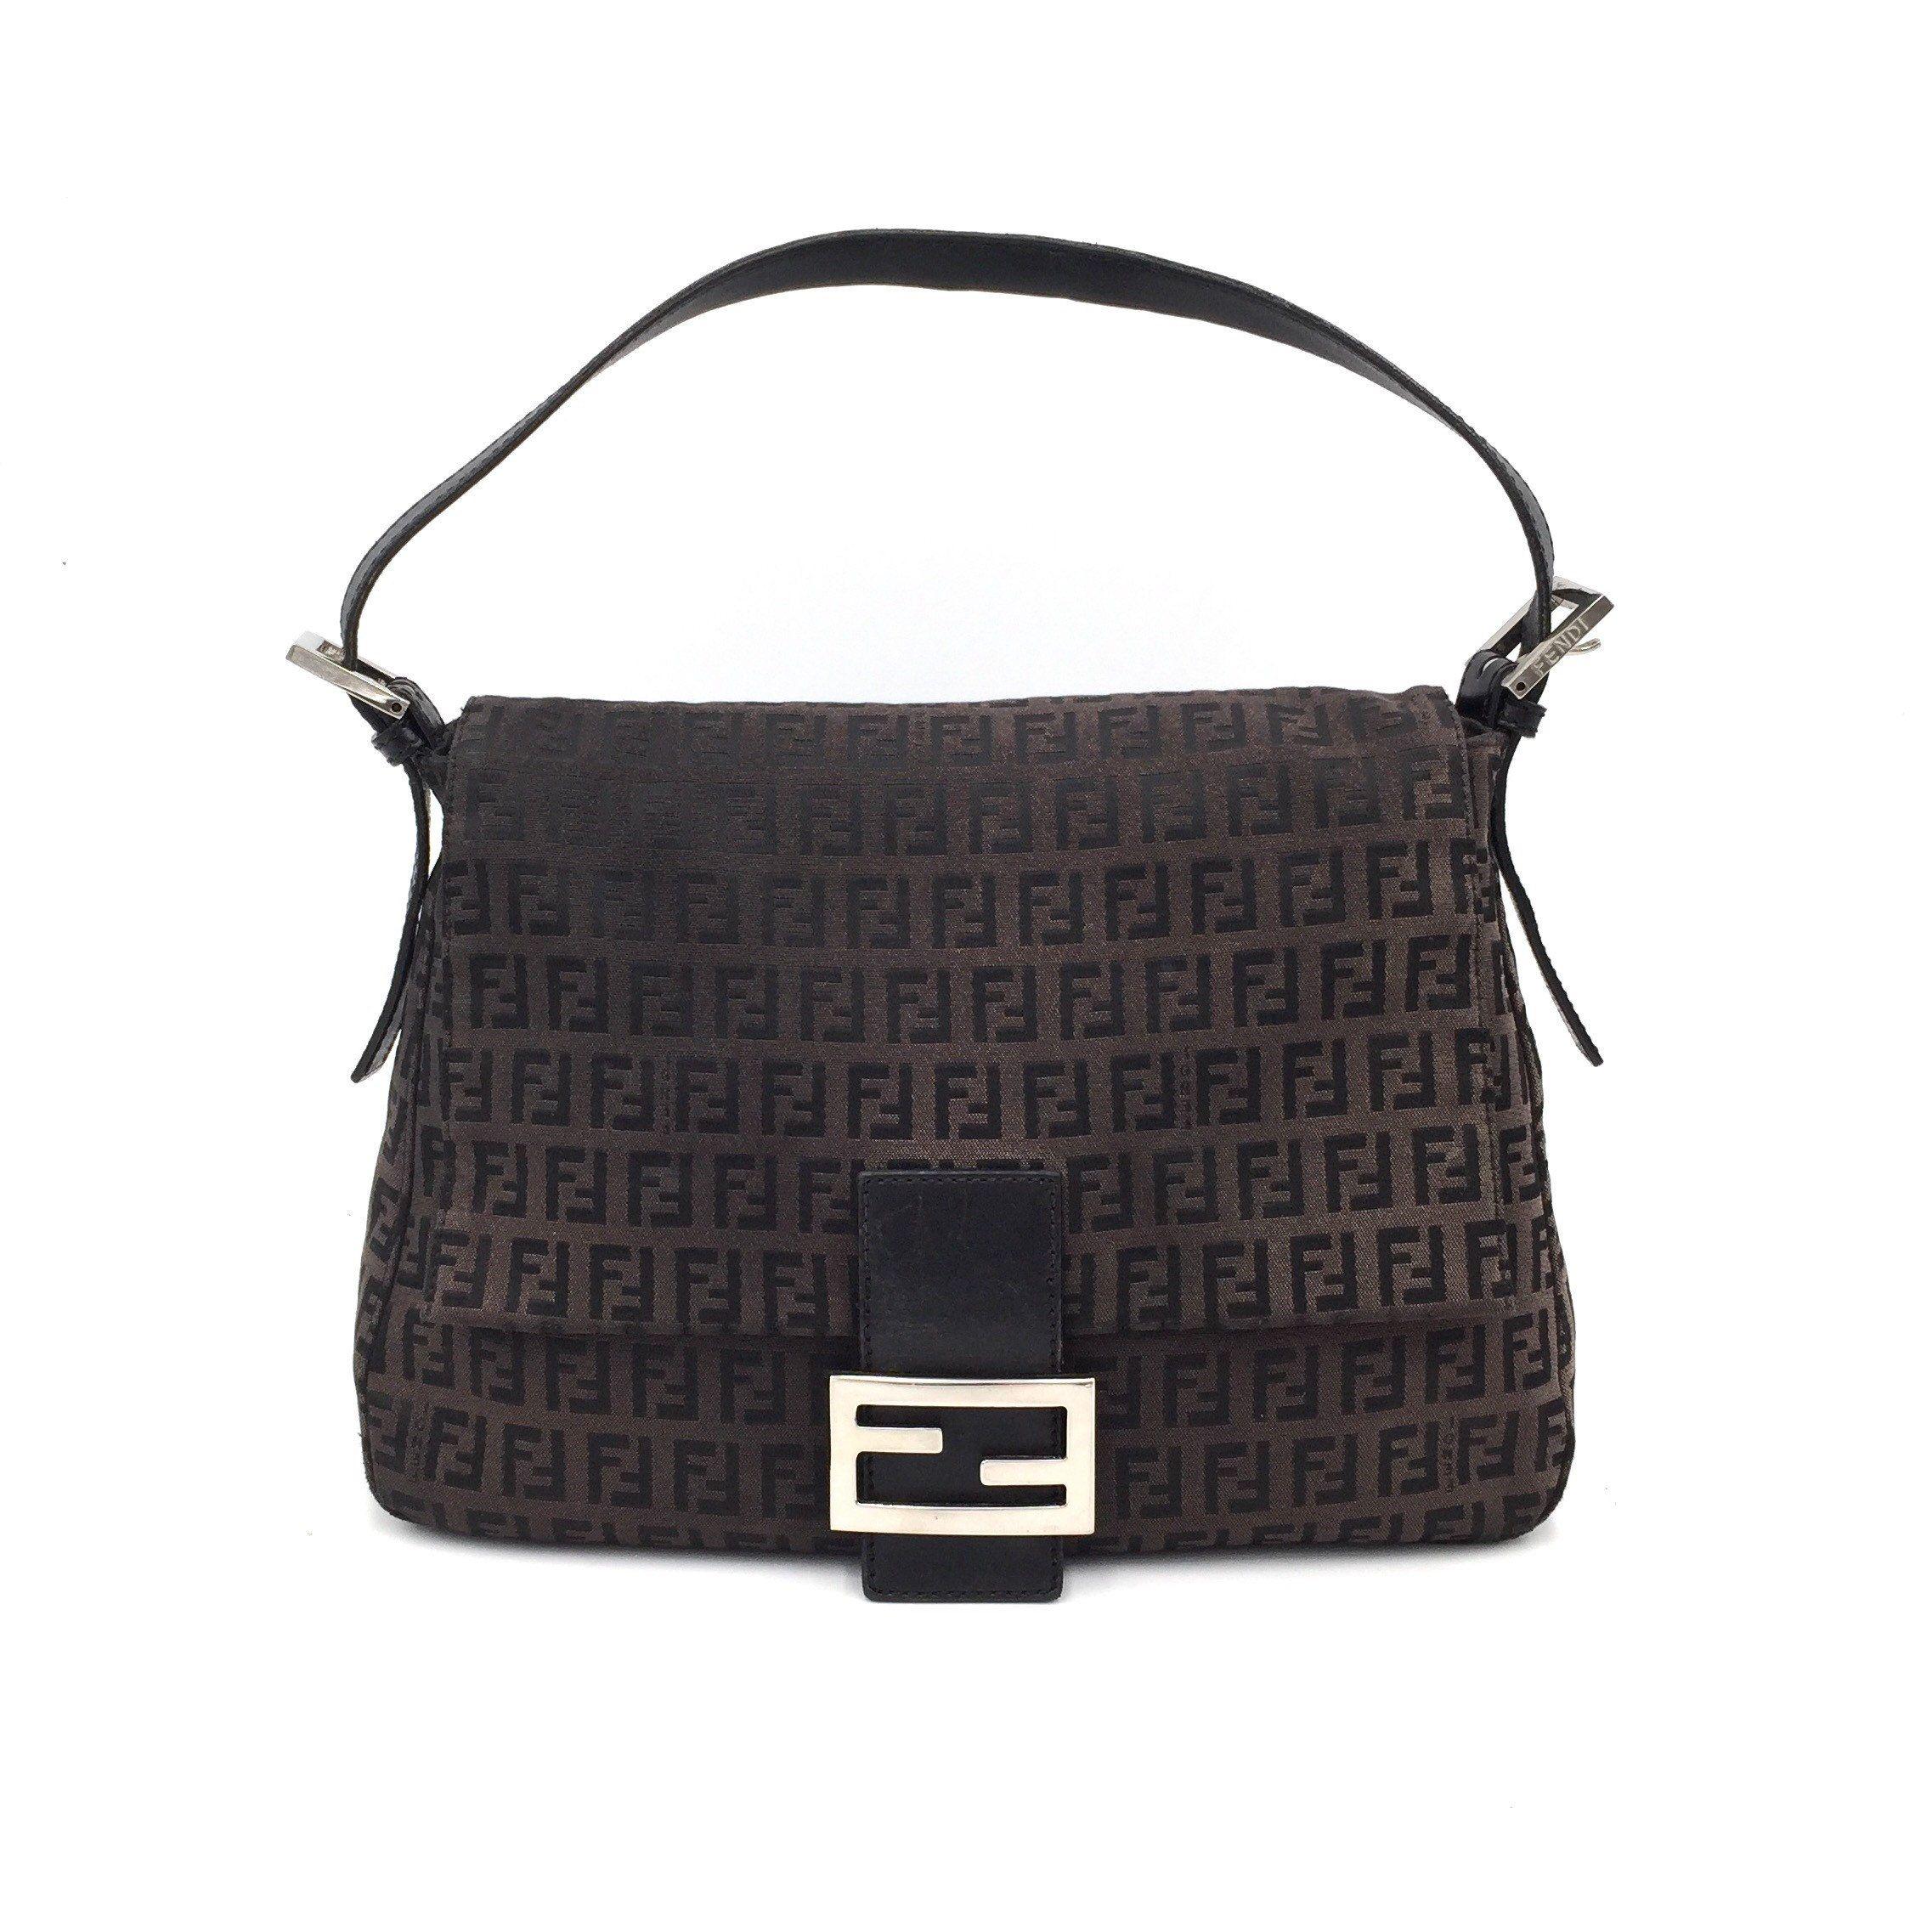 Authentic Vintage Fendi Zucchino Dark Brown Mama Baguette Brown Shoulder Bag Fendi Bags